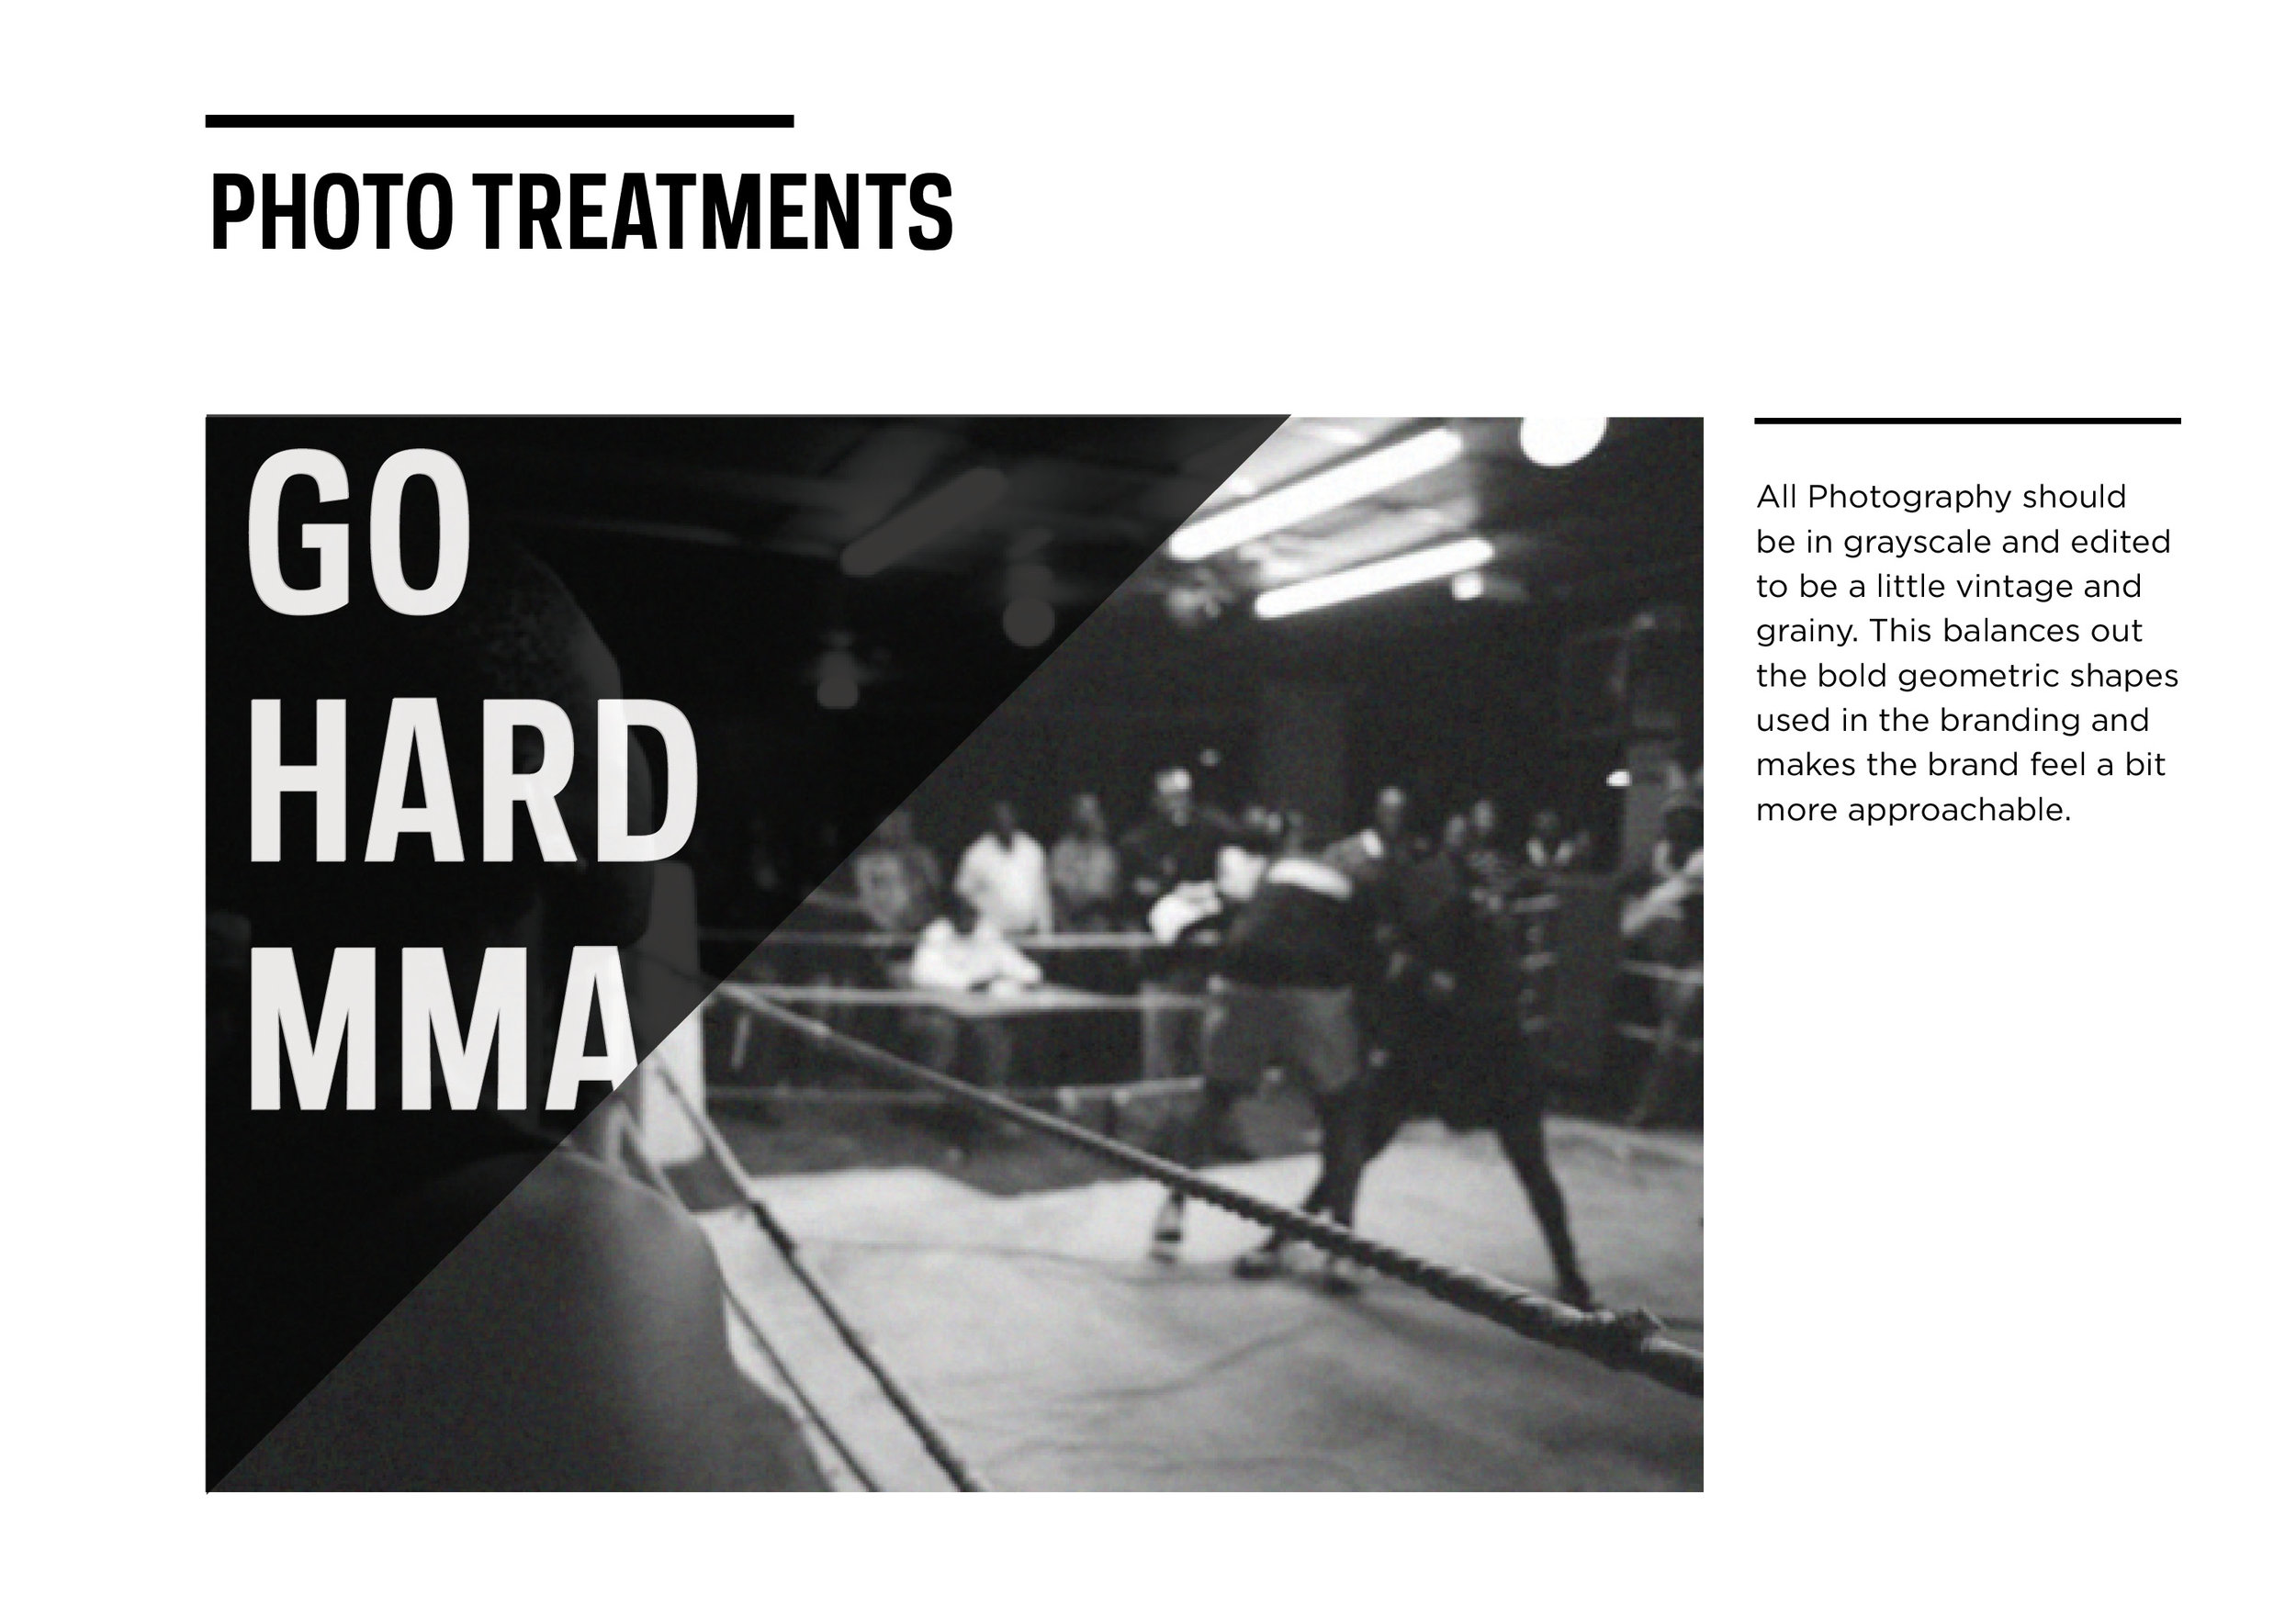 GO HARD MMA deliverables5.jpg